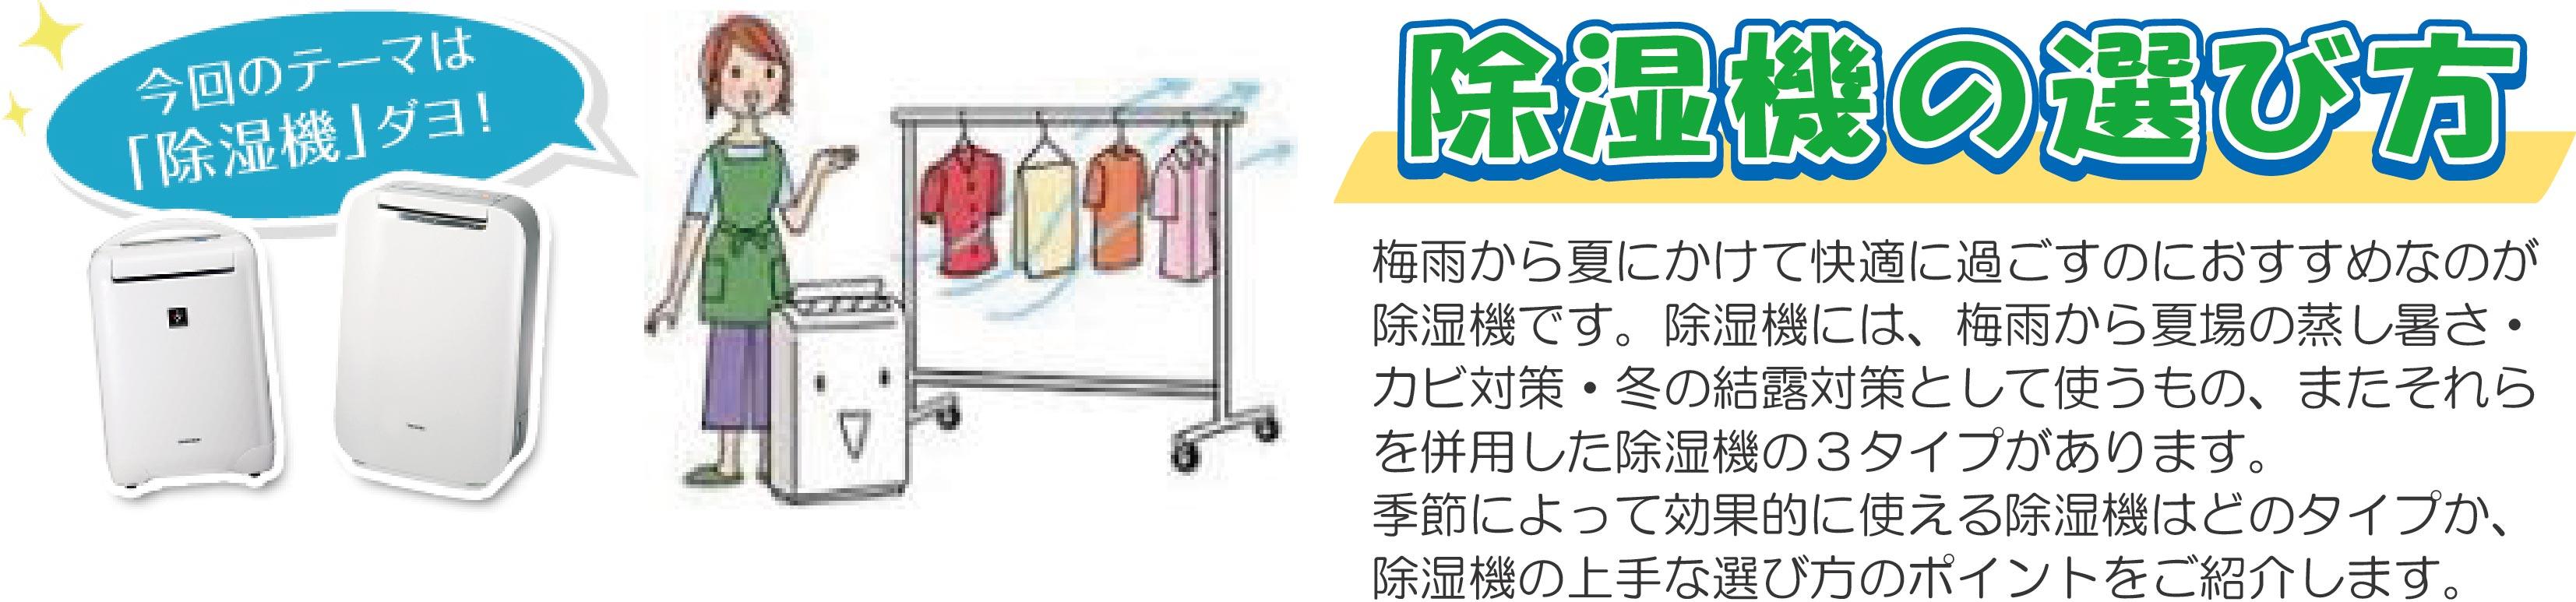 KuraSi-natu-sin86-14.jpg